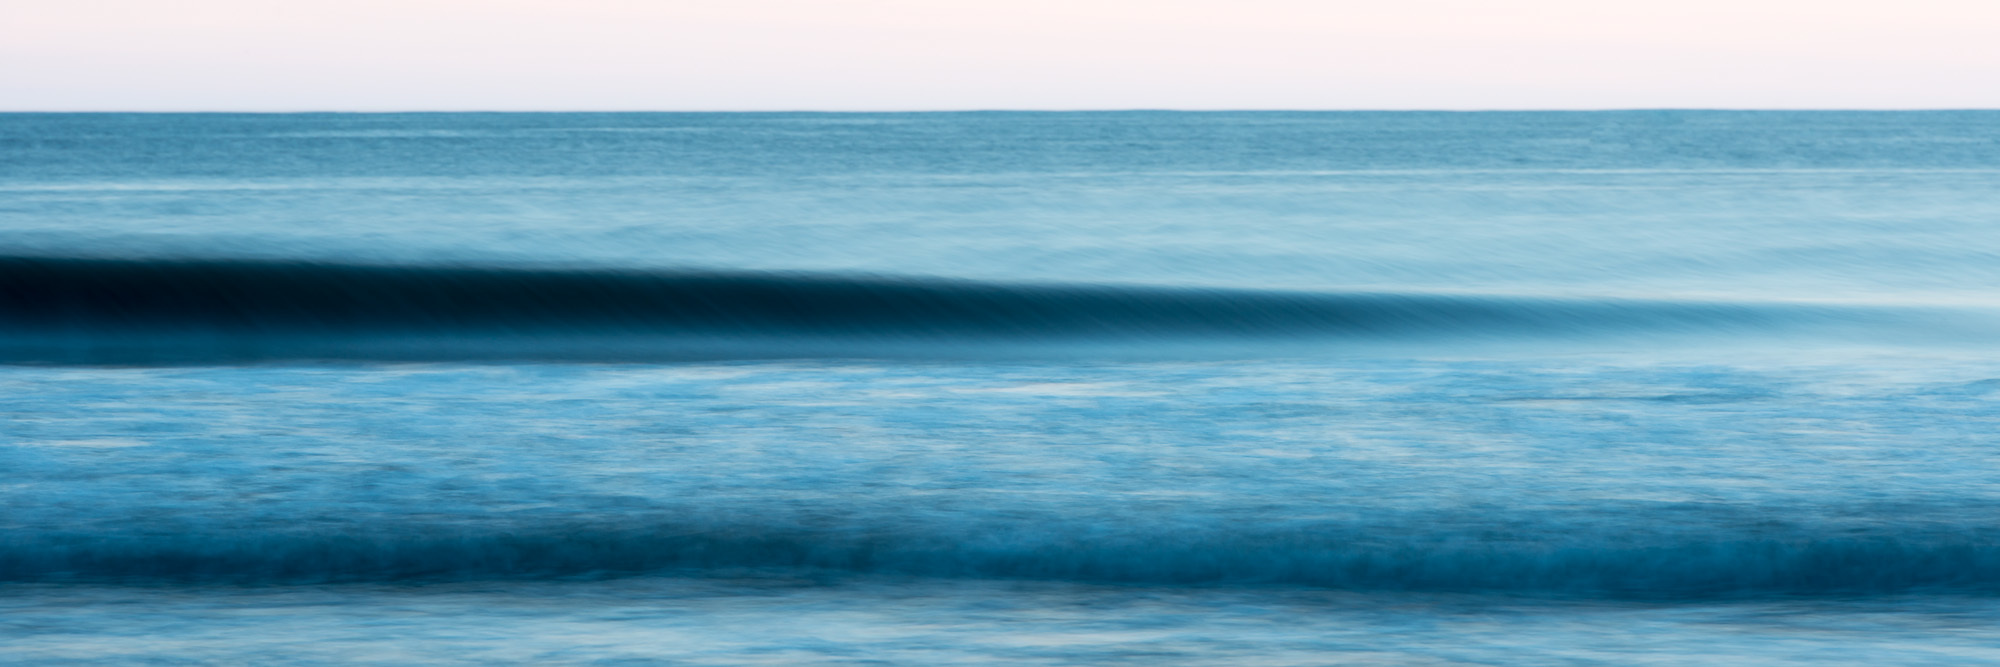 20121224_Avila Beach_3127.jpg